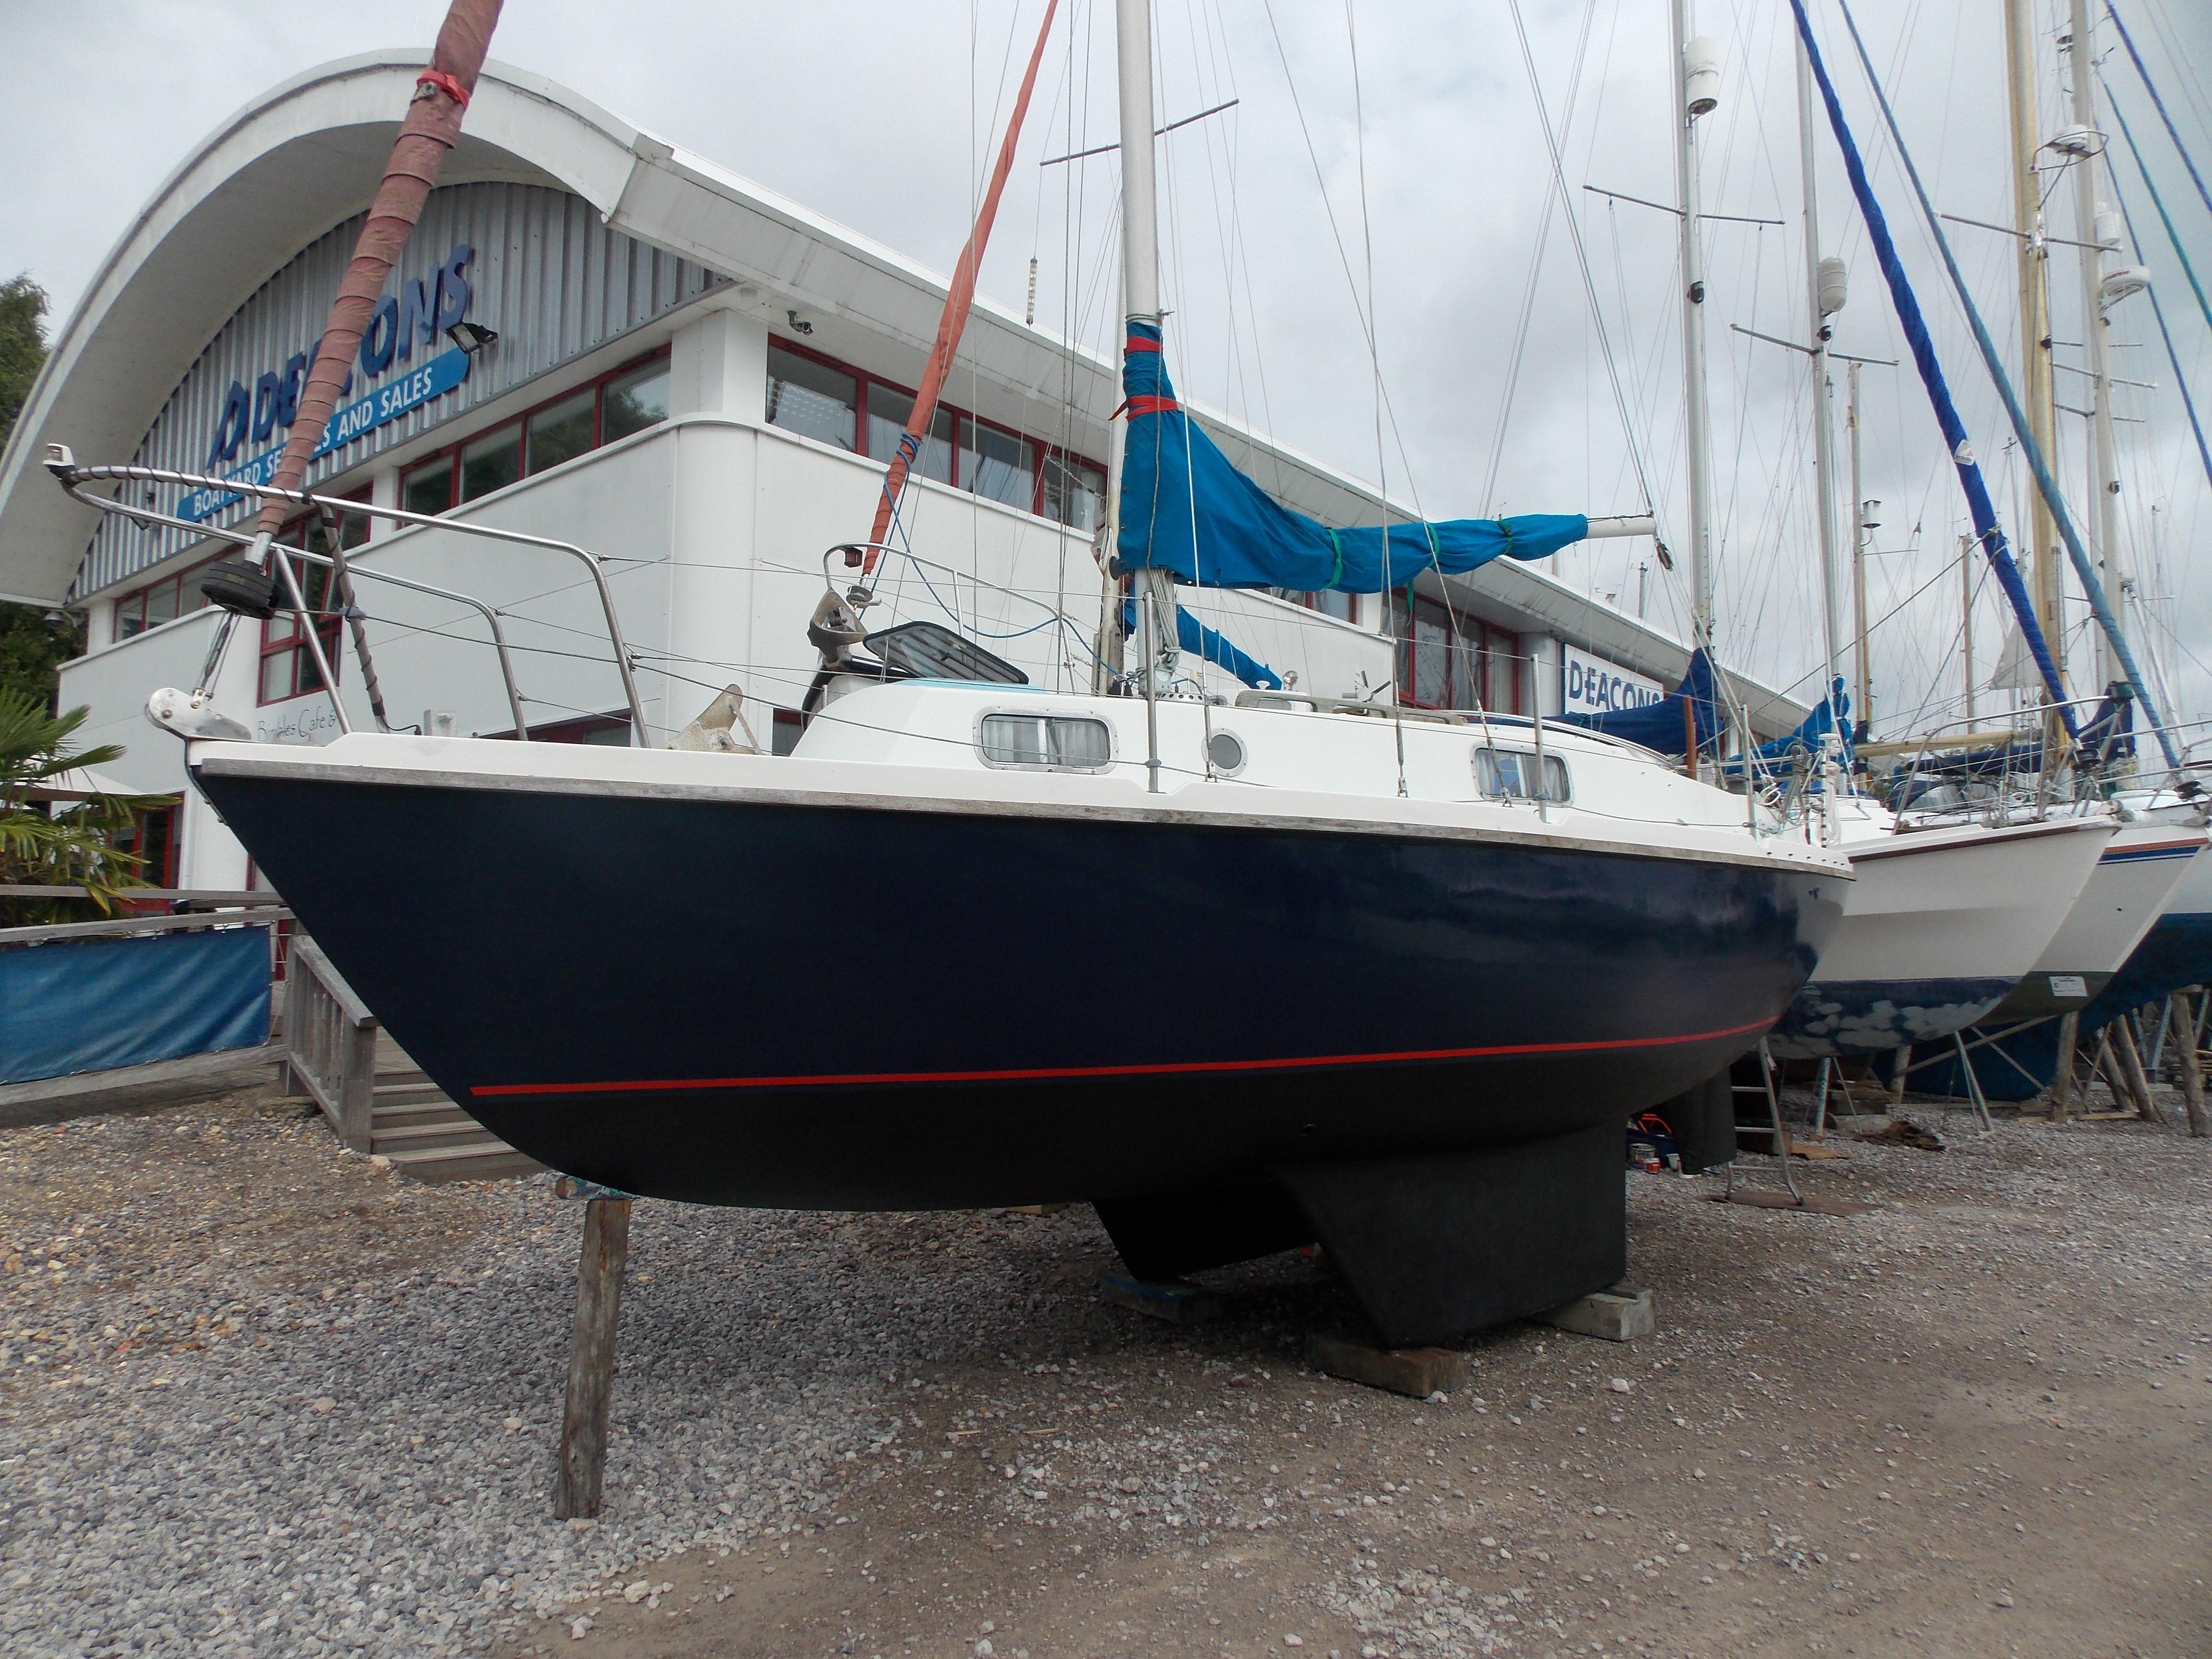 Colvic 26 sailor, South Coast, Hampshire